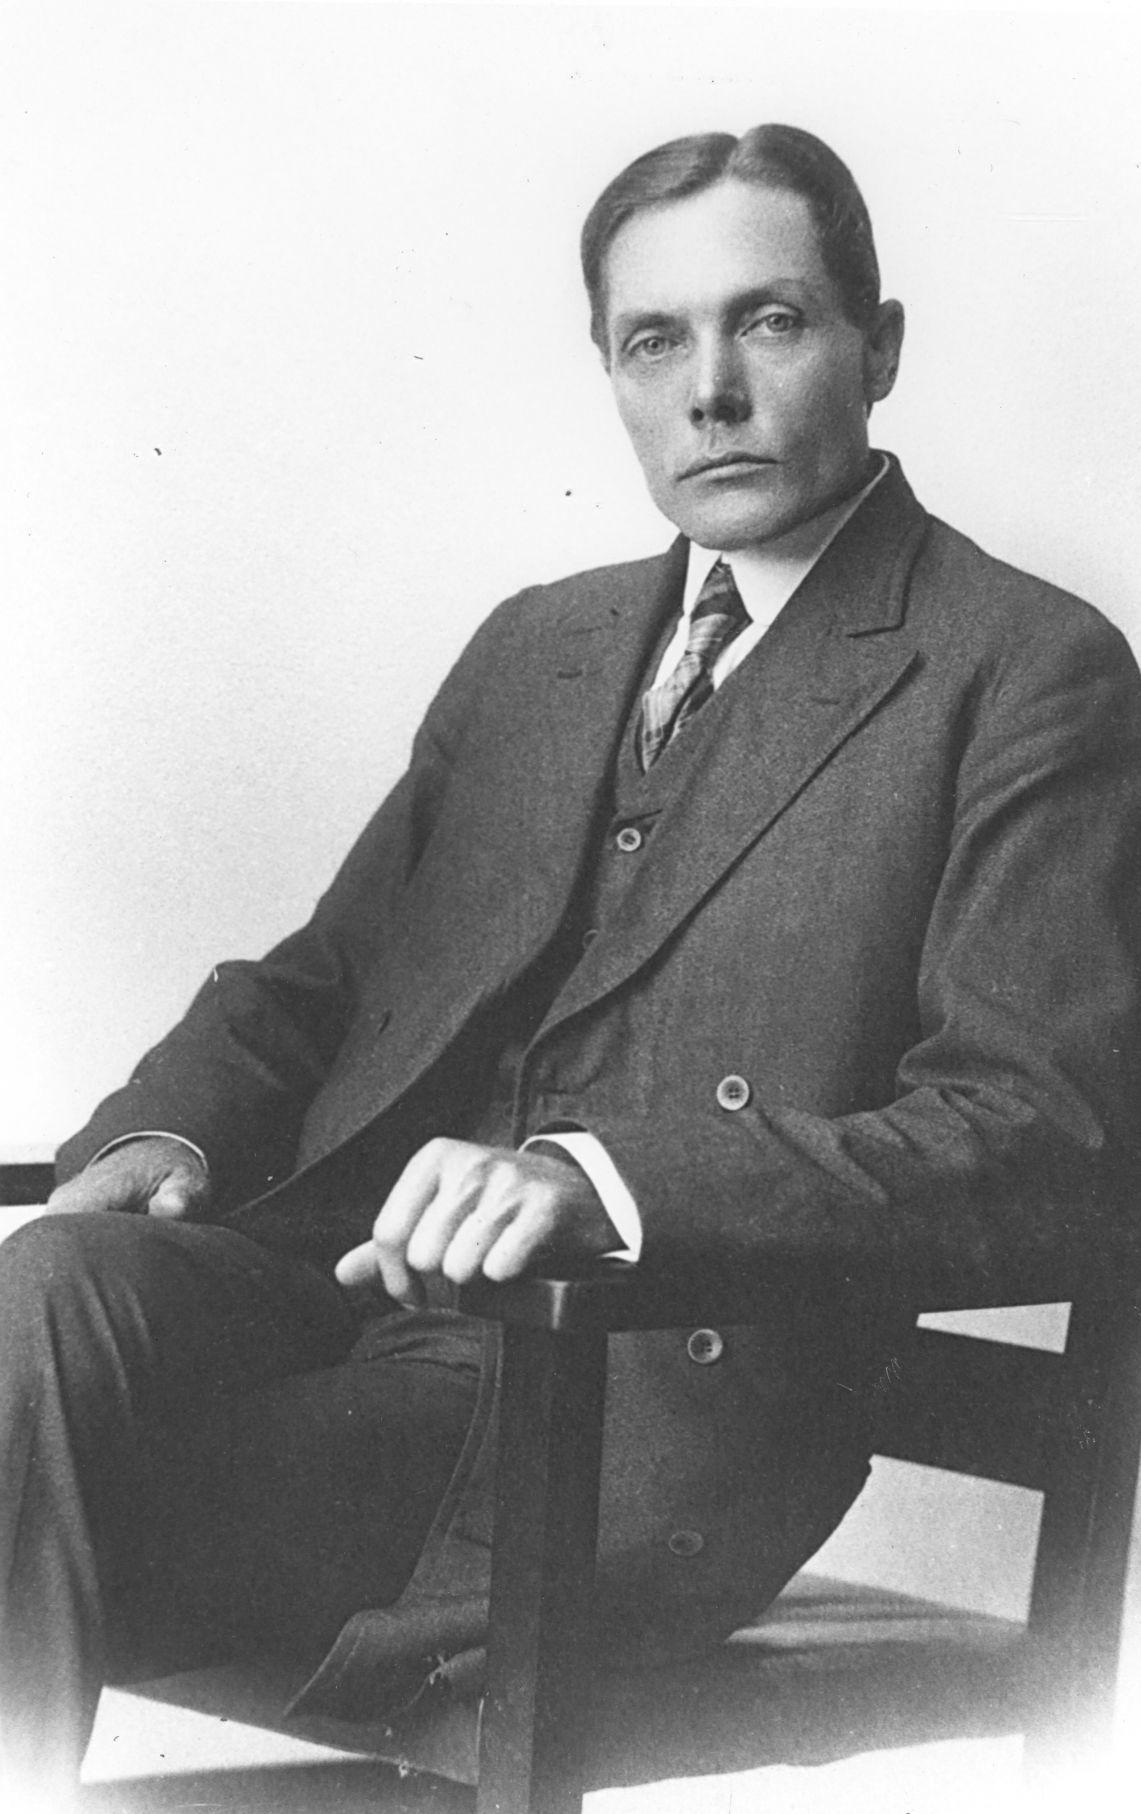 Wallace Short